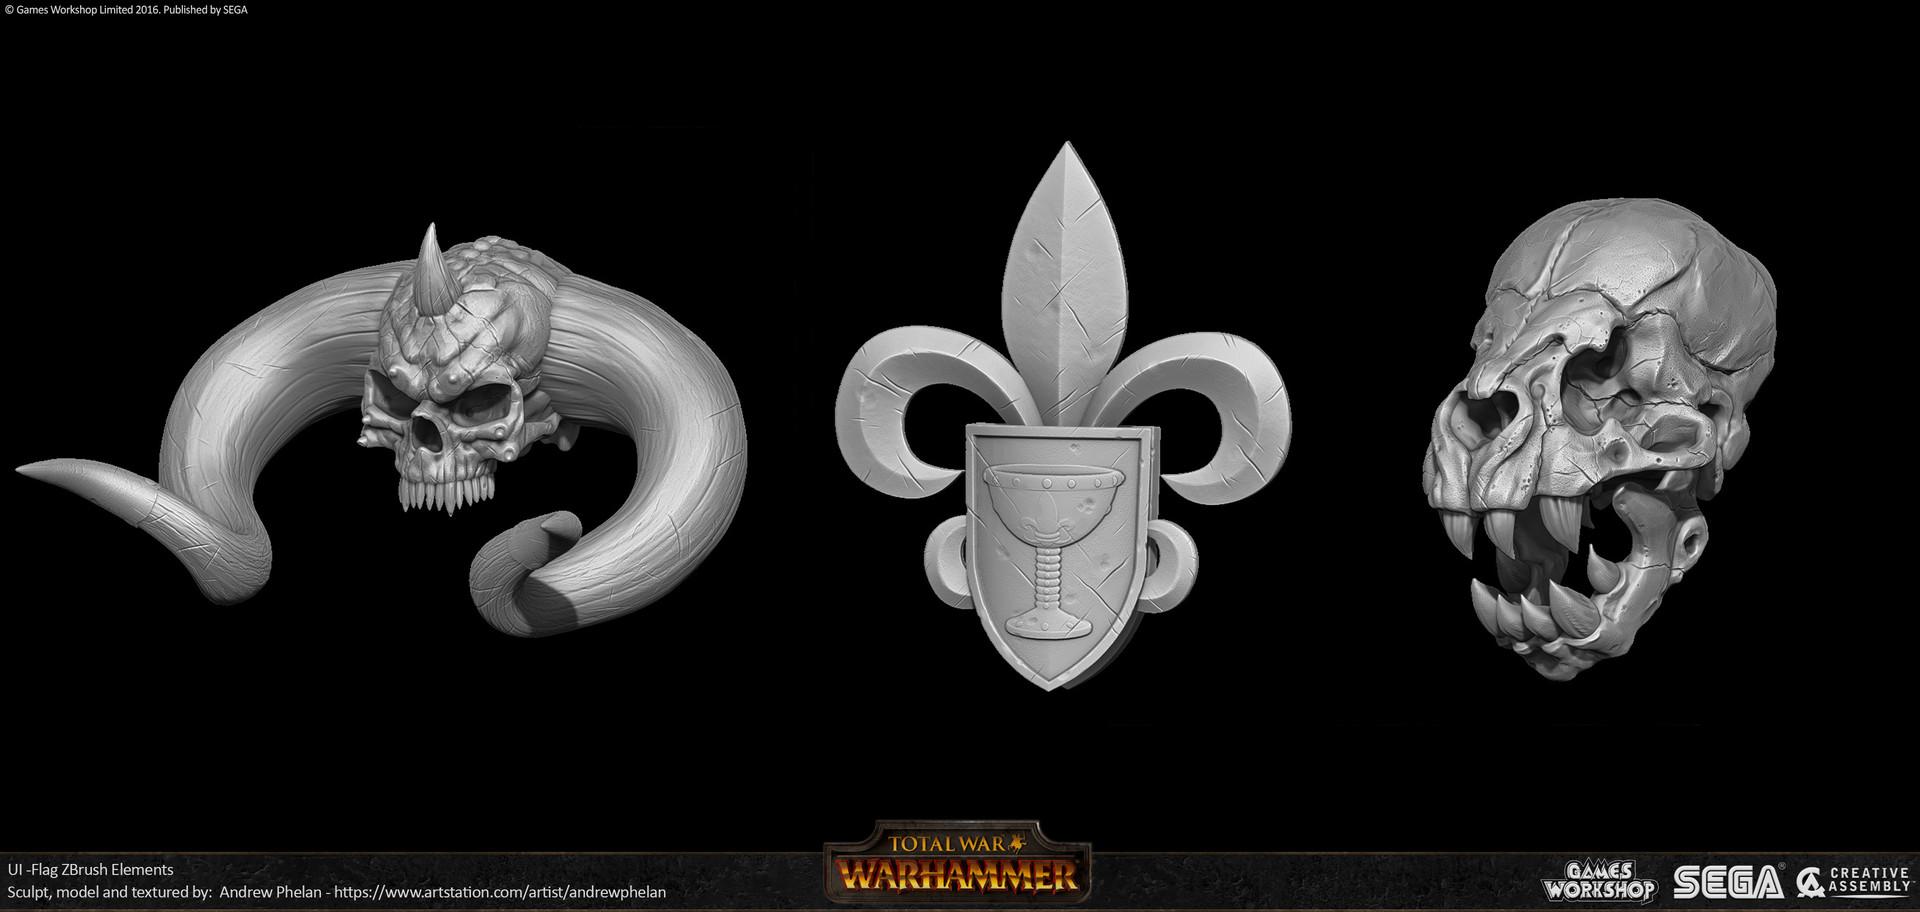 ArtStation - UI Flags for Warhammer - Total War, Andrew Phelan